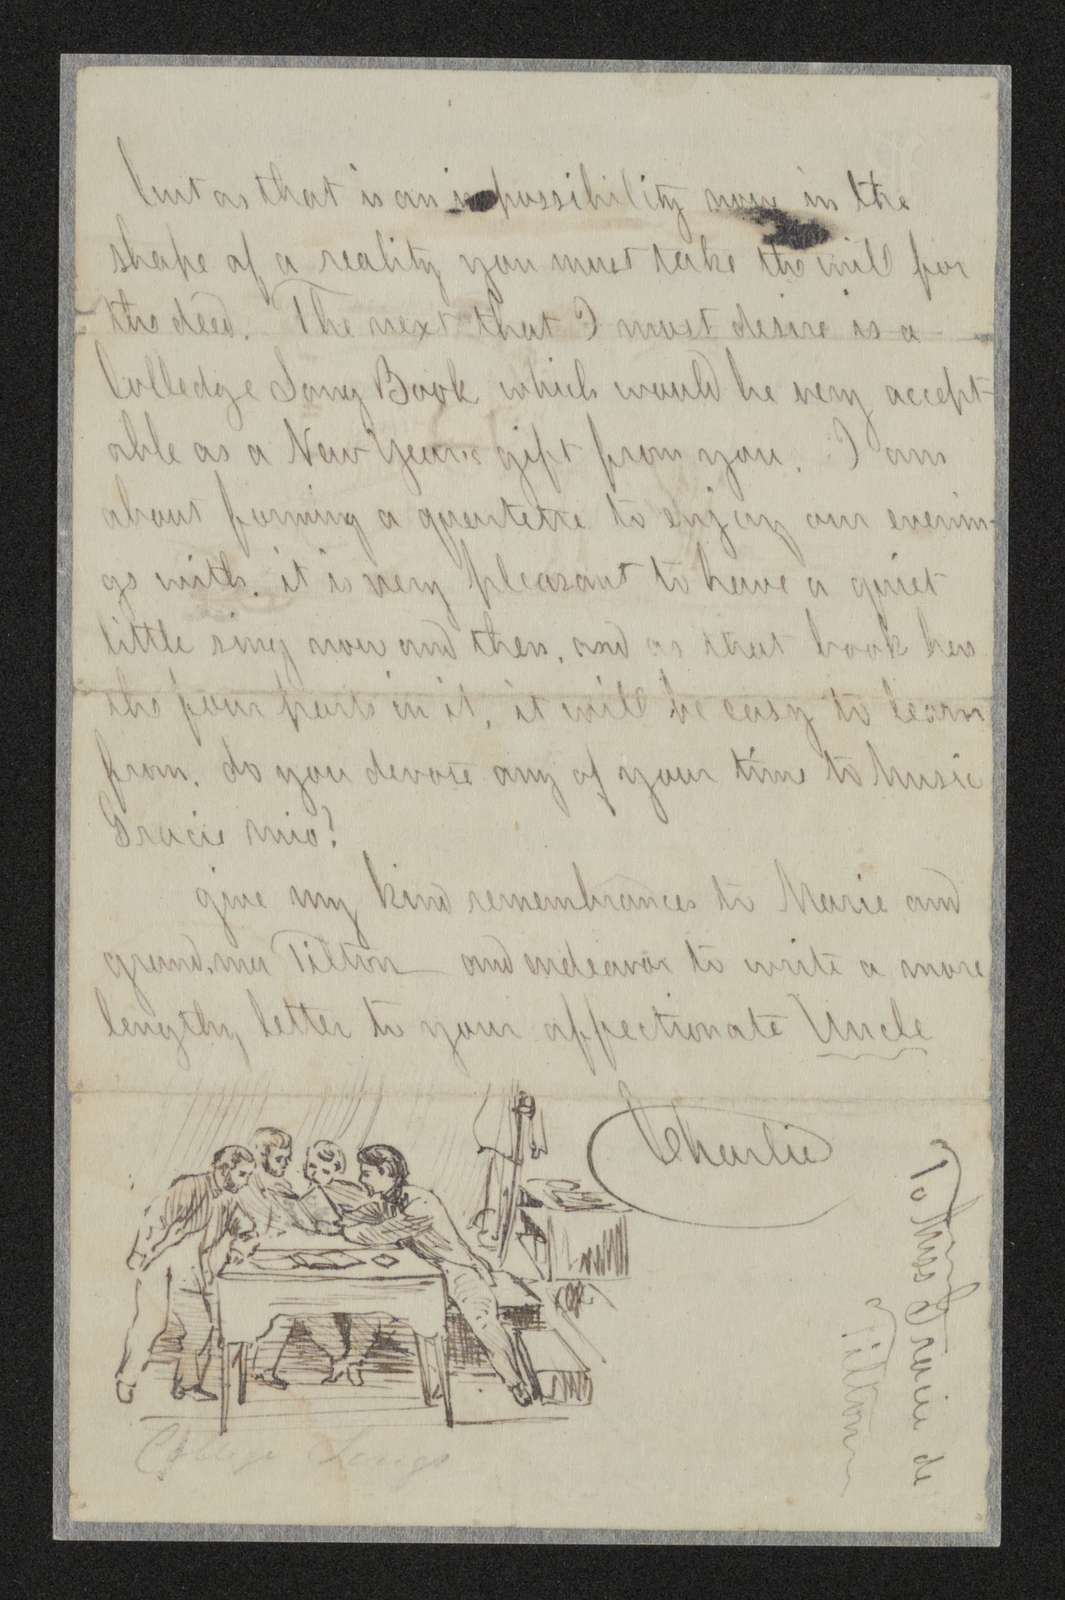 Charles Wellington Reed Papers: Correspondence; 1863; Jan.-Mar.